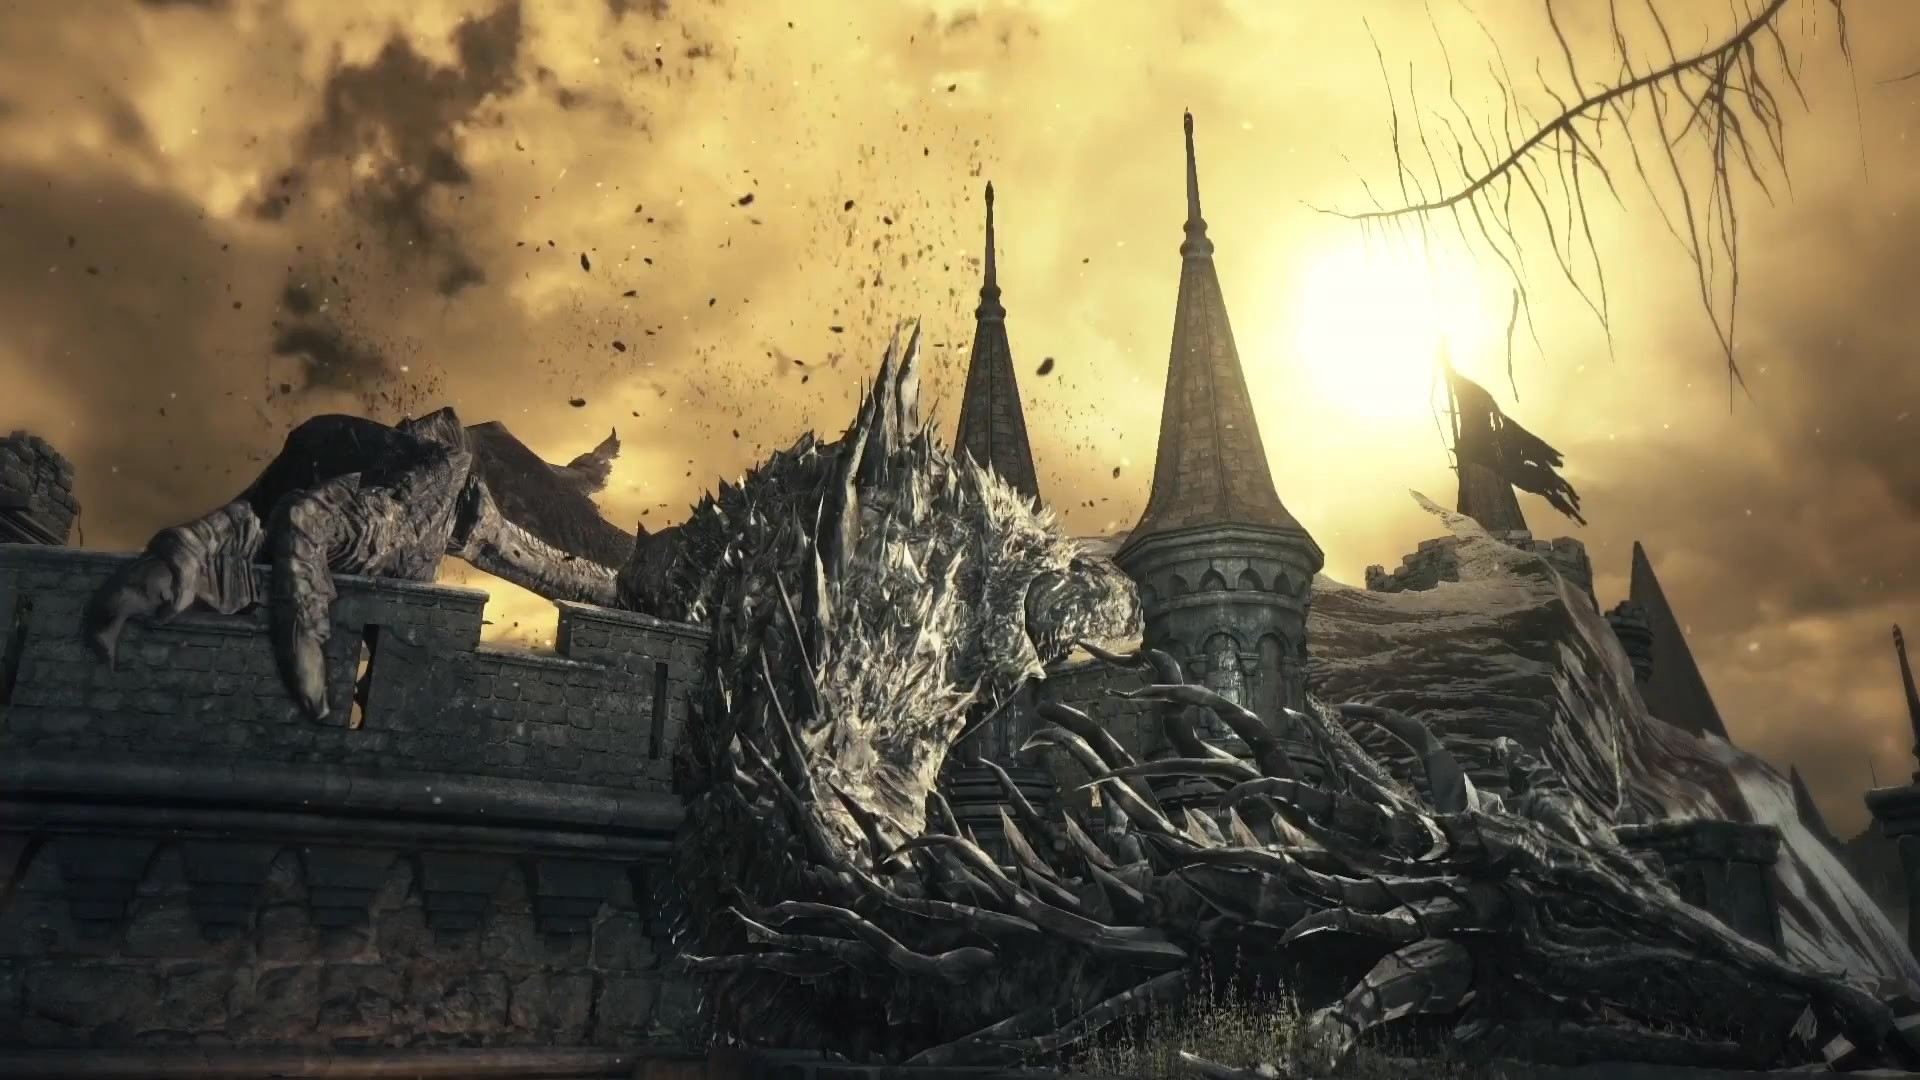 Dark Souls 3 Gameplay Trailer – Dark Souls 3 Trailer Gamescom 2015 – YouTube